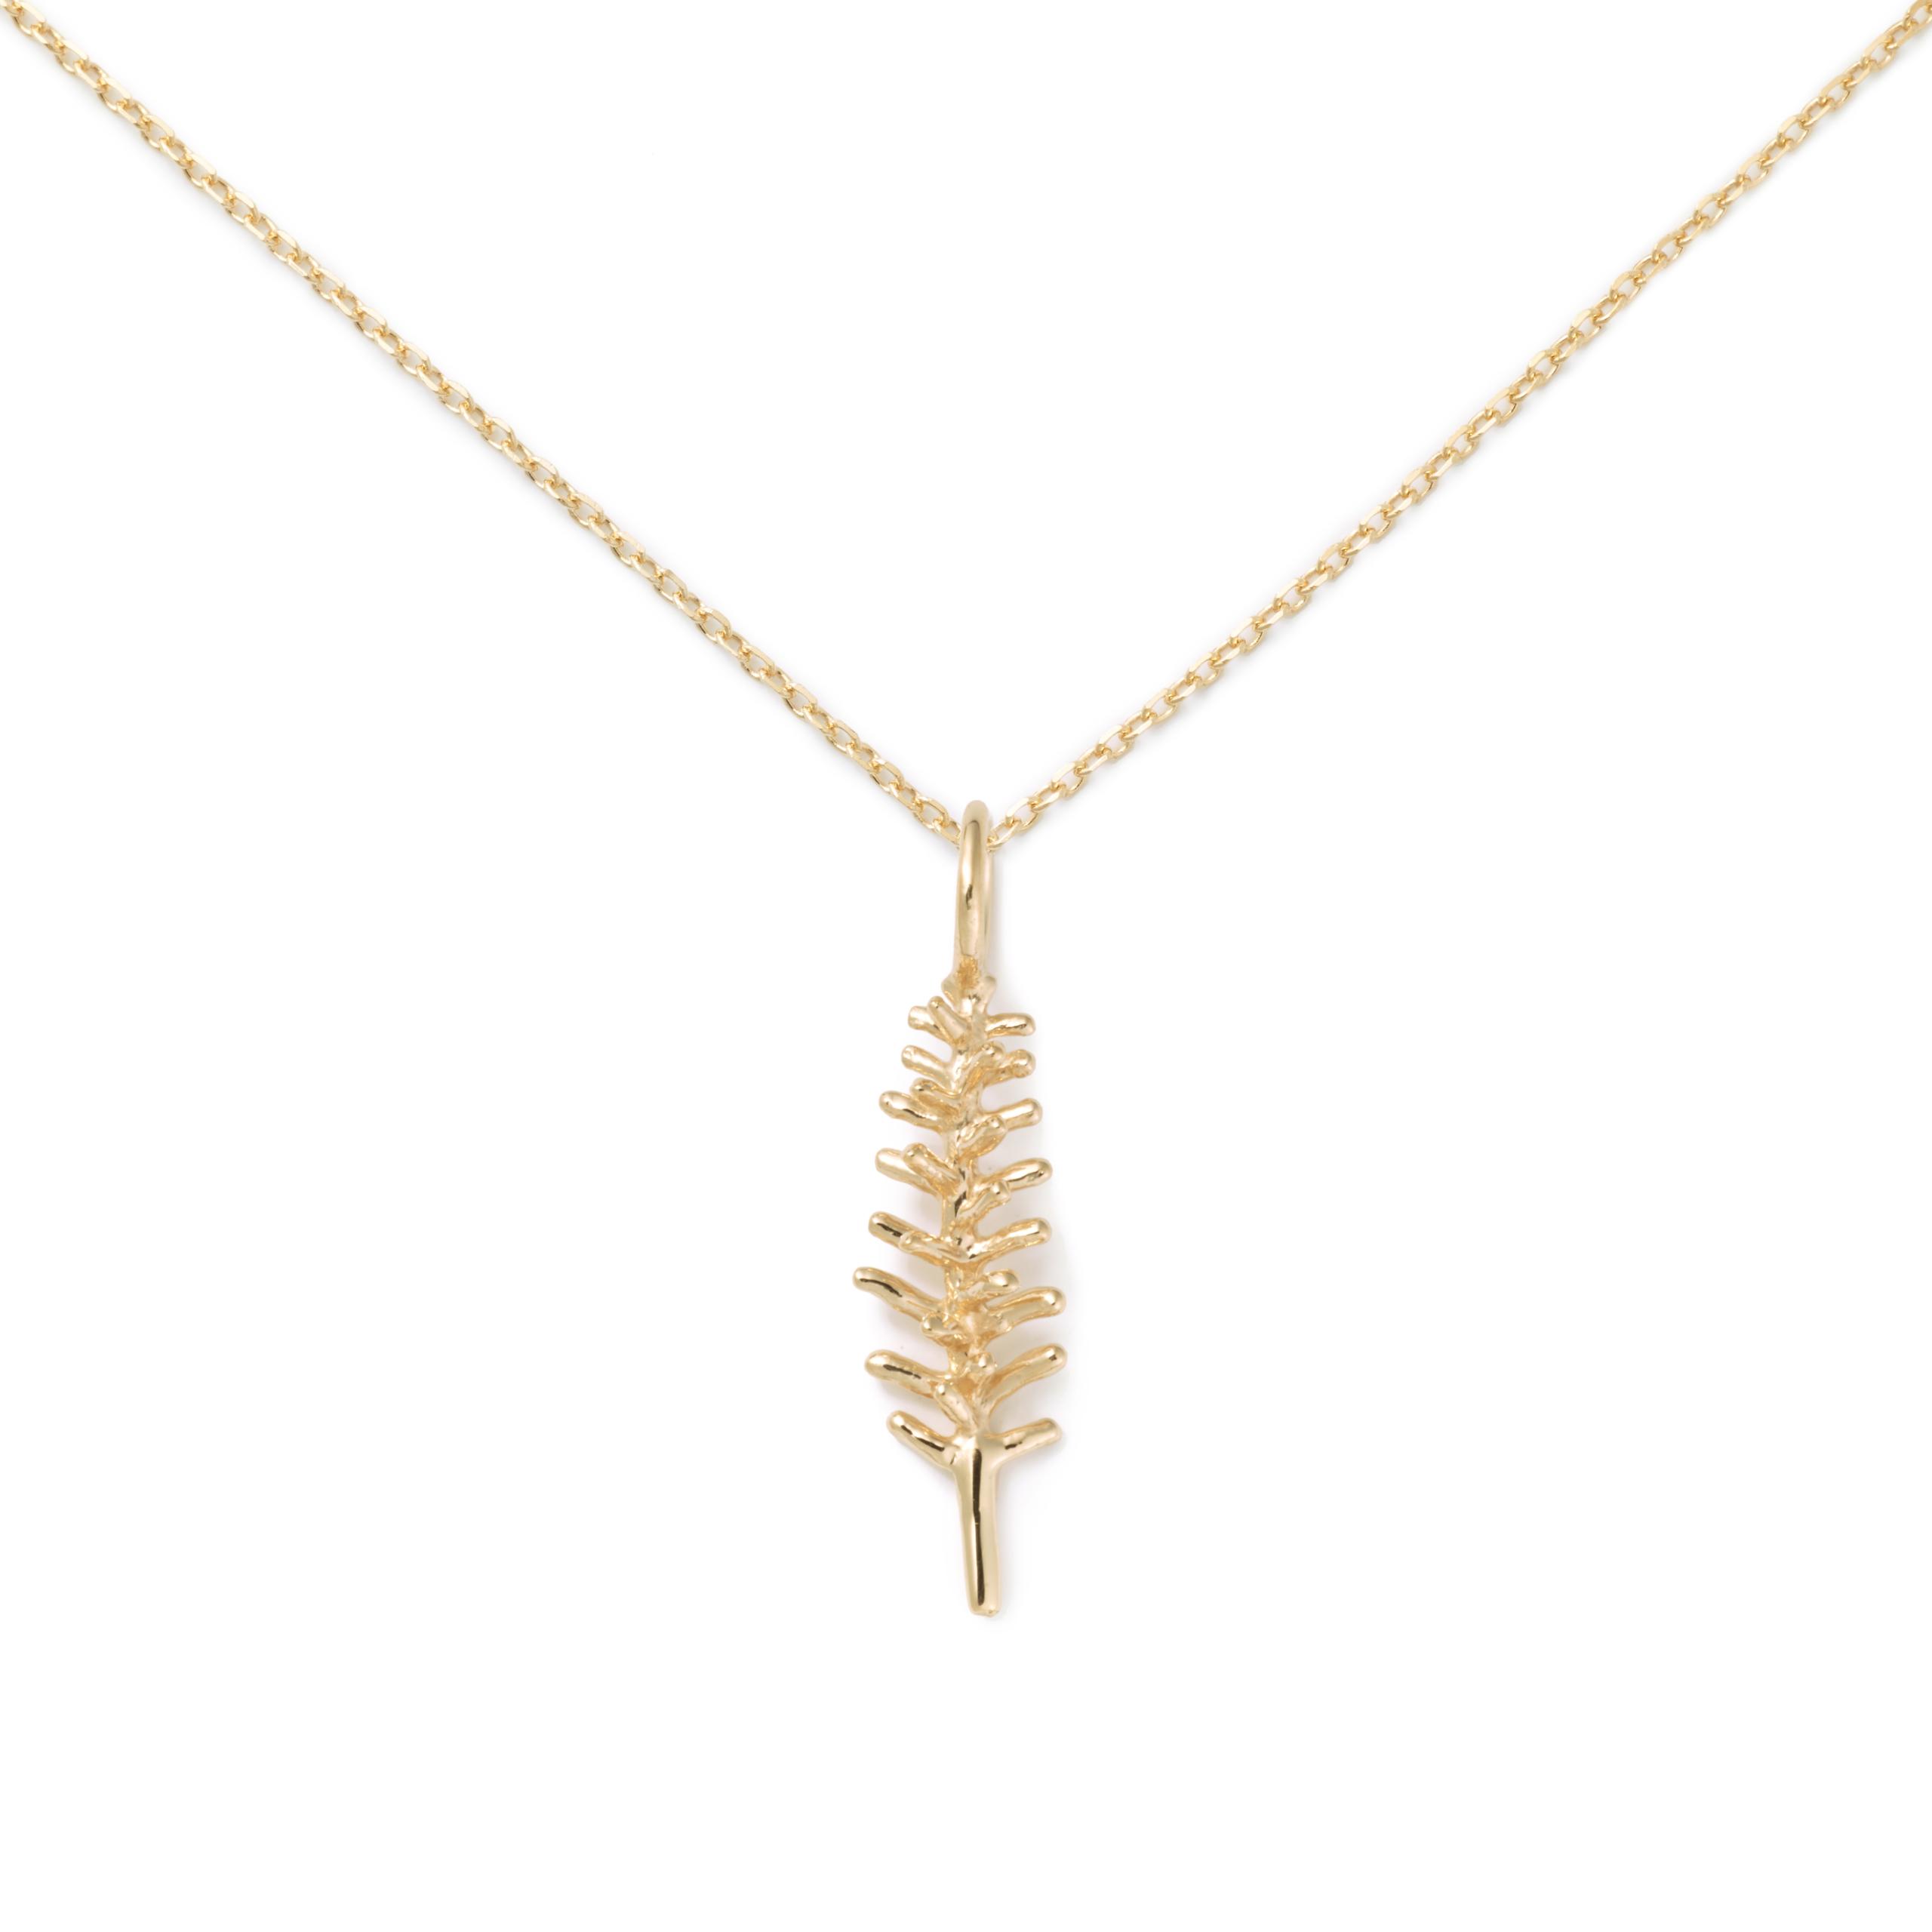 Rosemary Pendant, 14K Yellow Gold